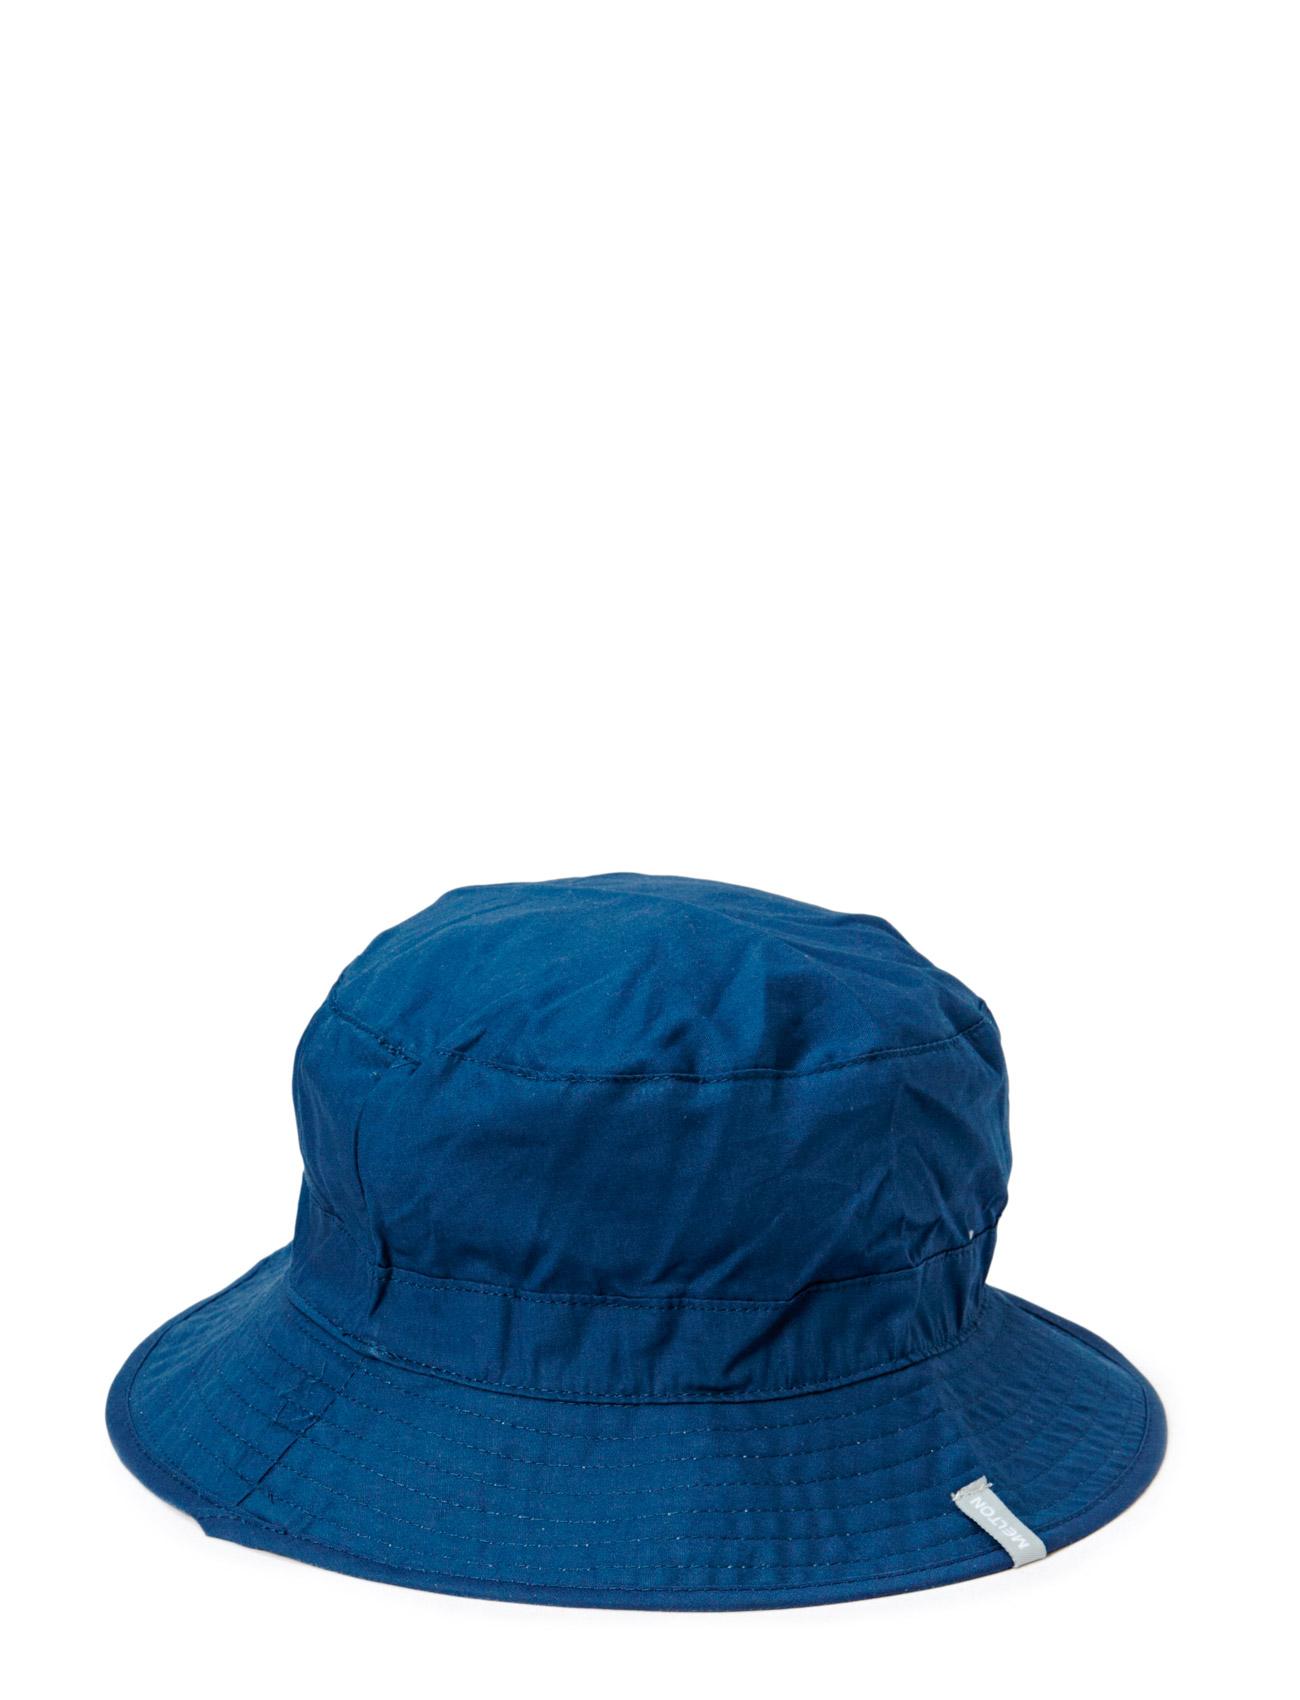 Melton - Bucket Hat - Solid colour - kapelusz przeciwsłoneczny - 285/marine - 1